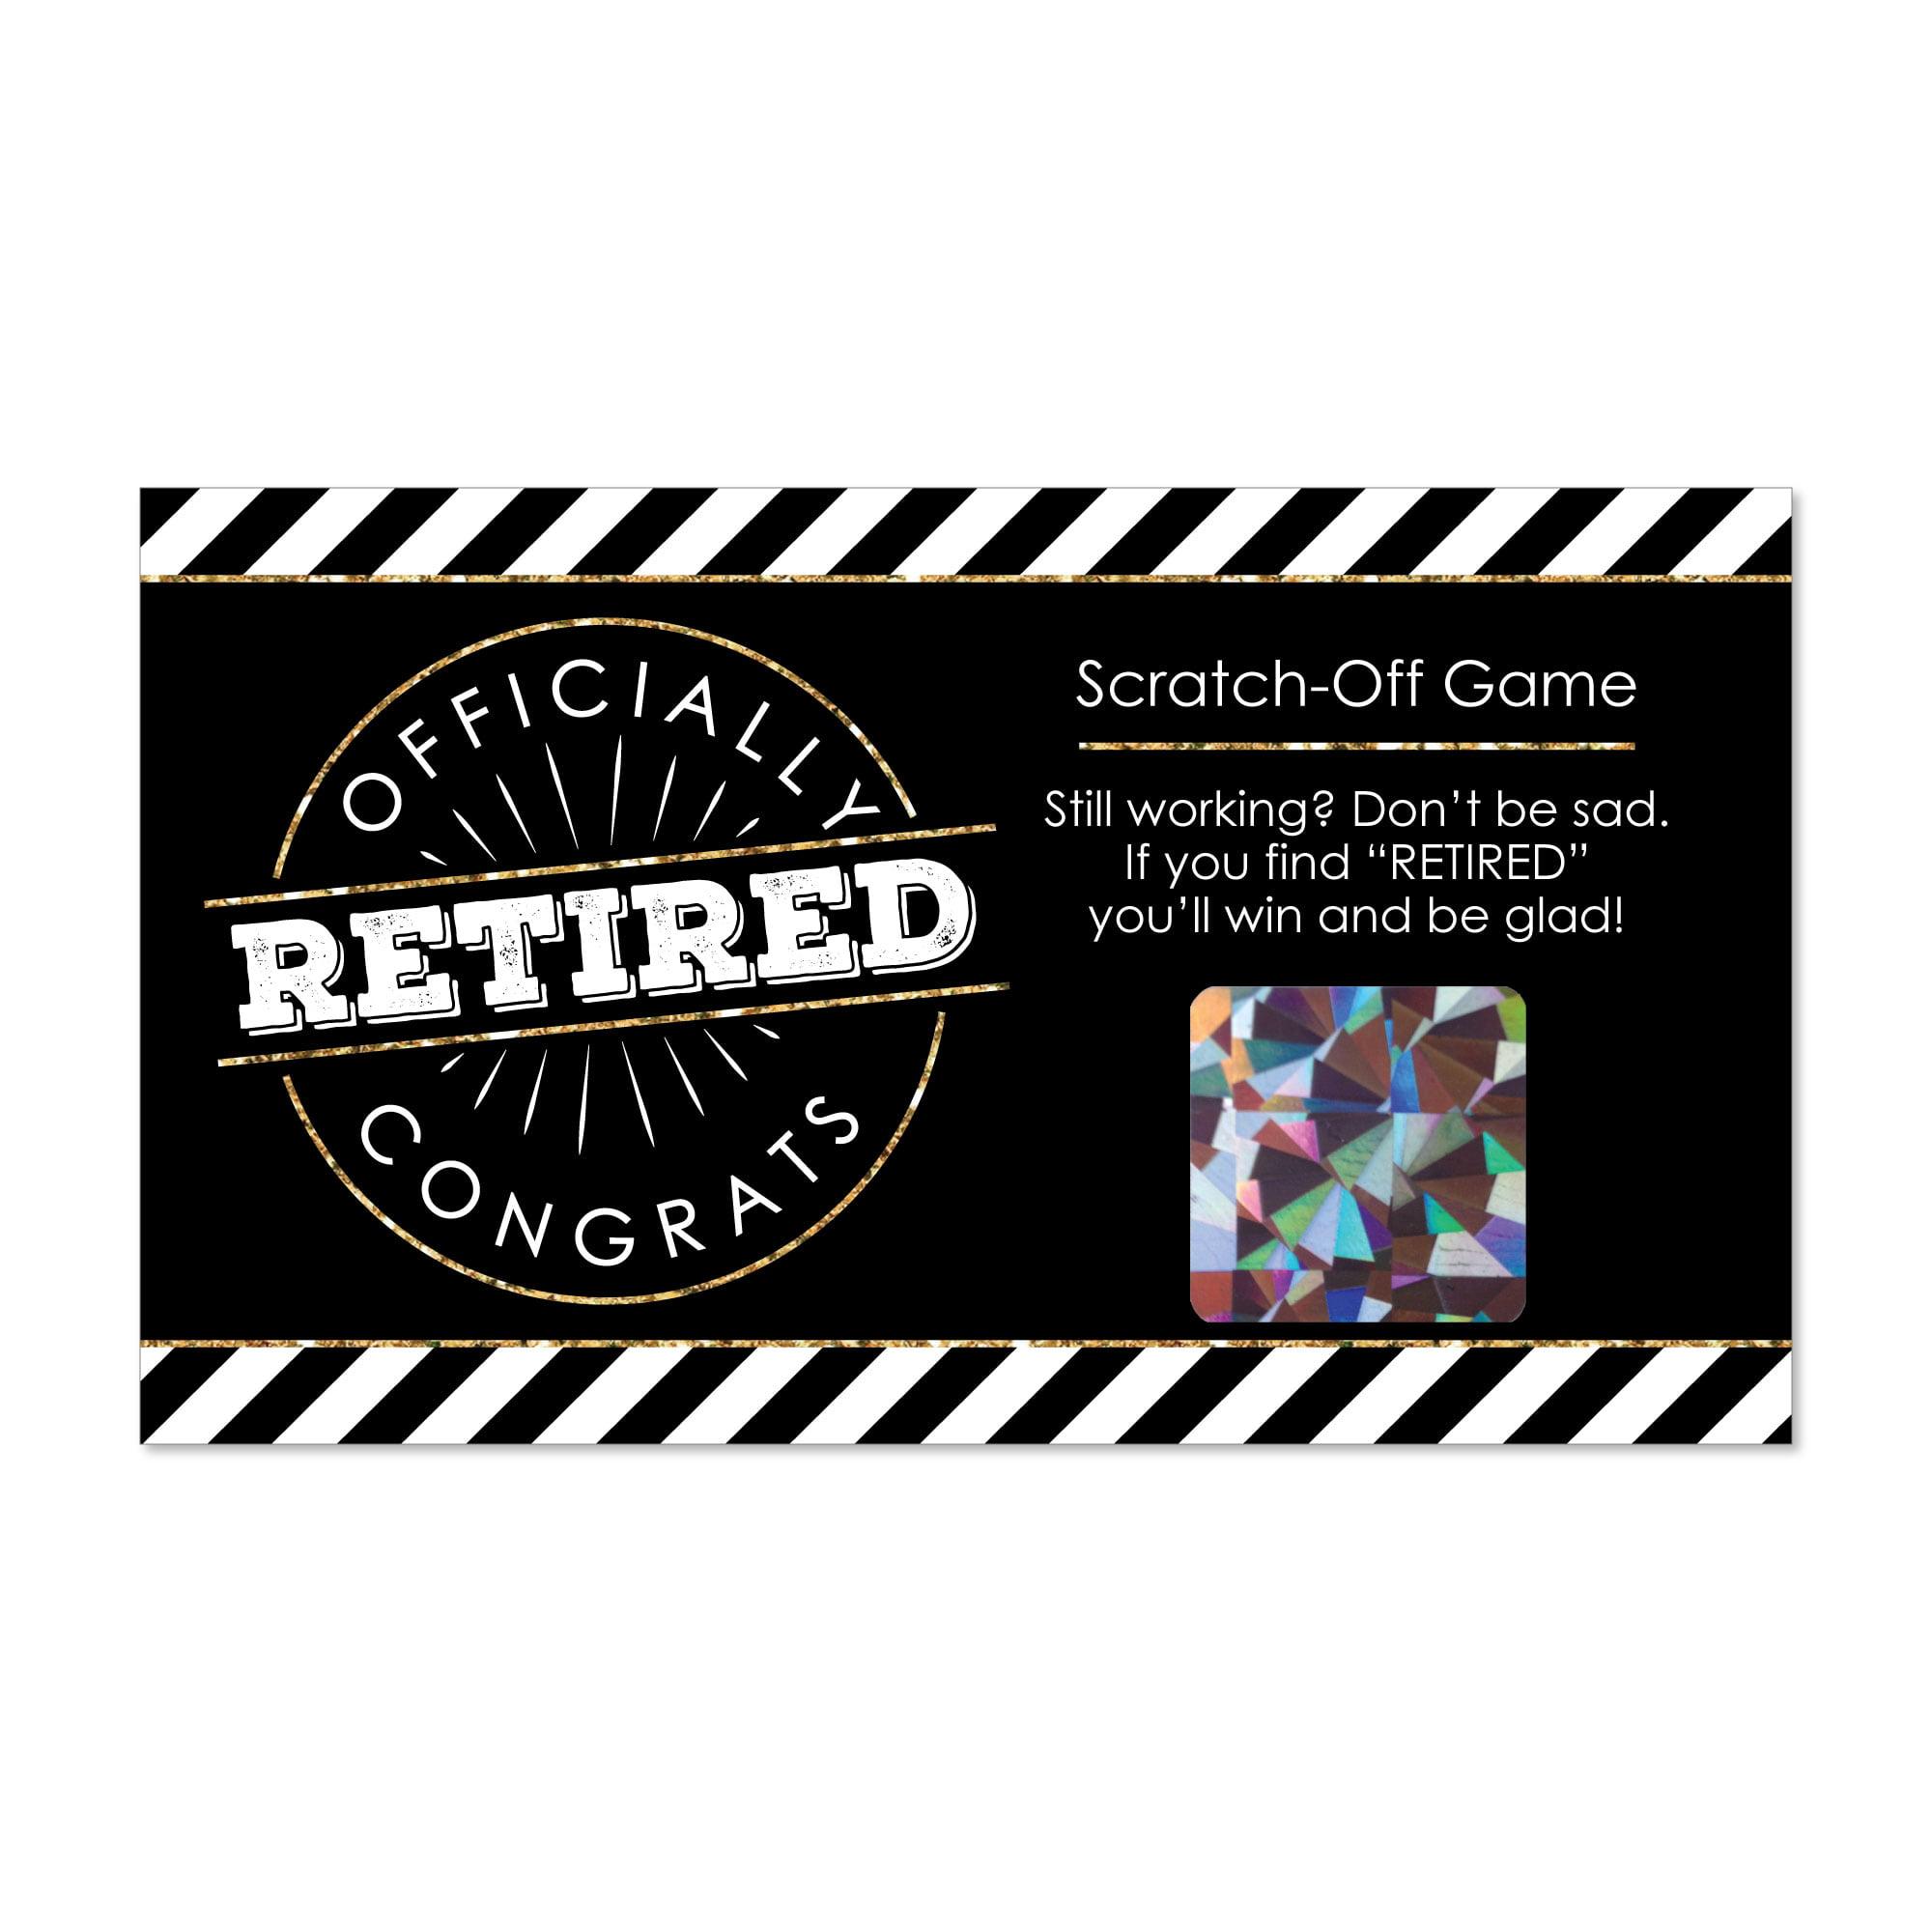 Happy Retirement - Retirement Party Scratch Off Cards - 22 Count